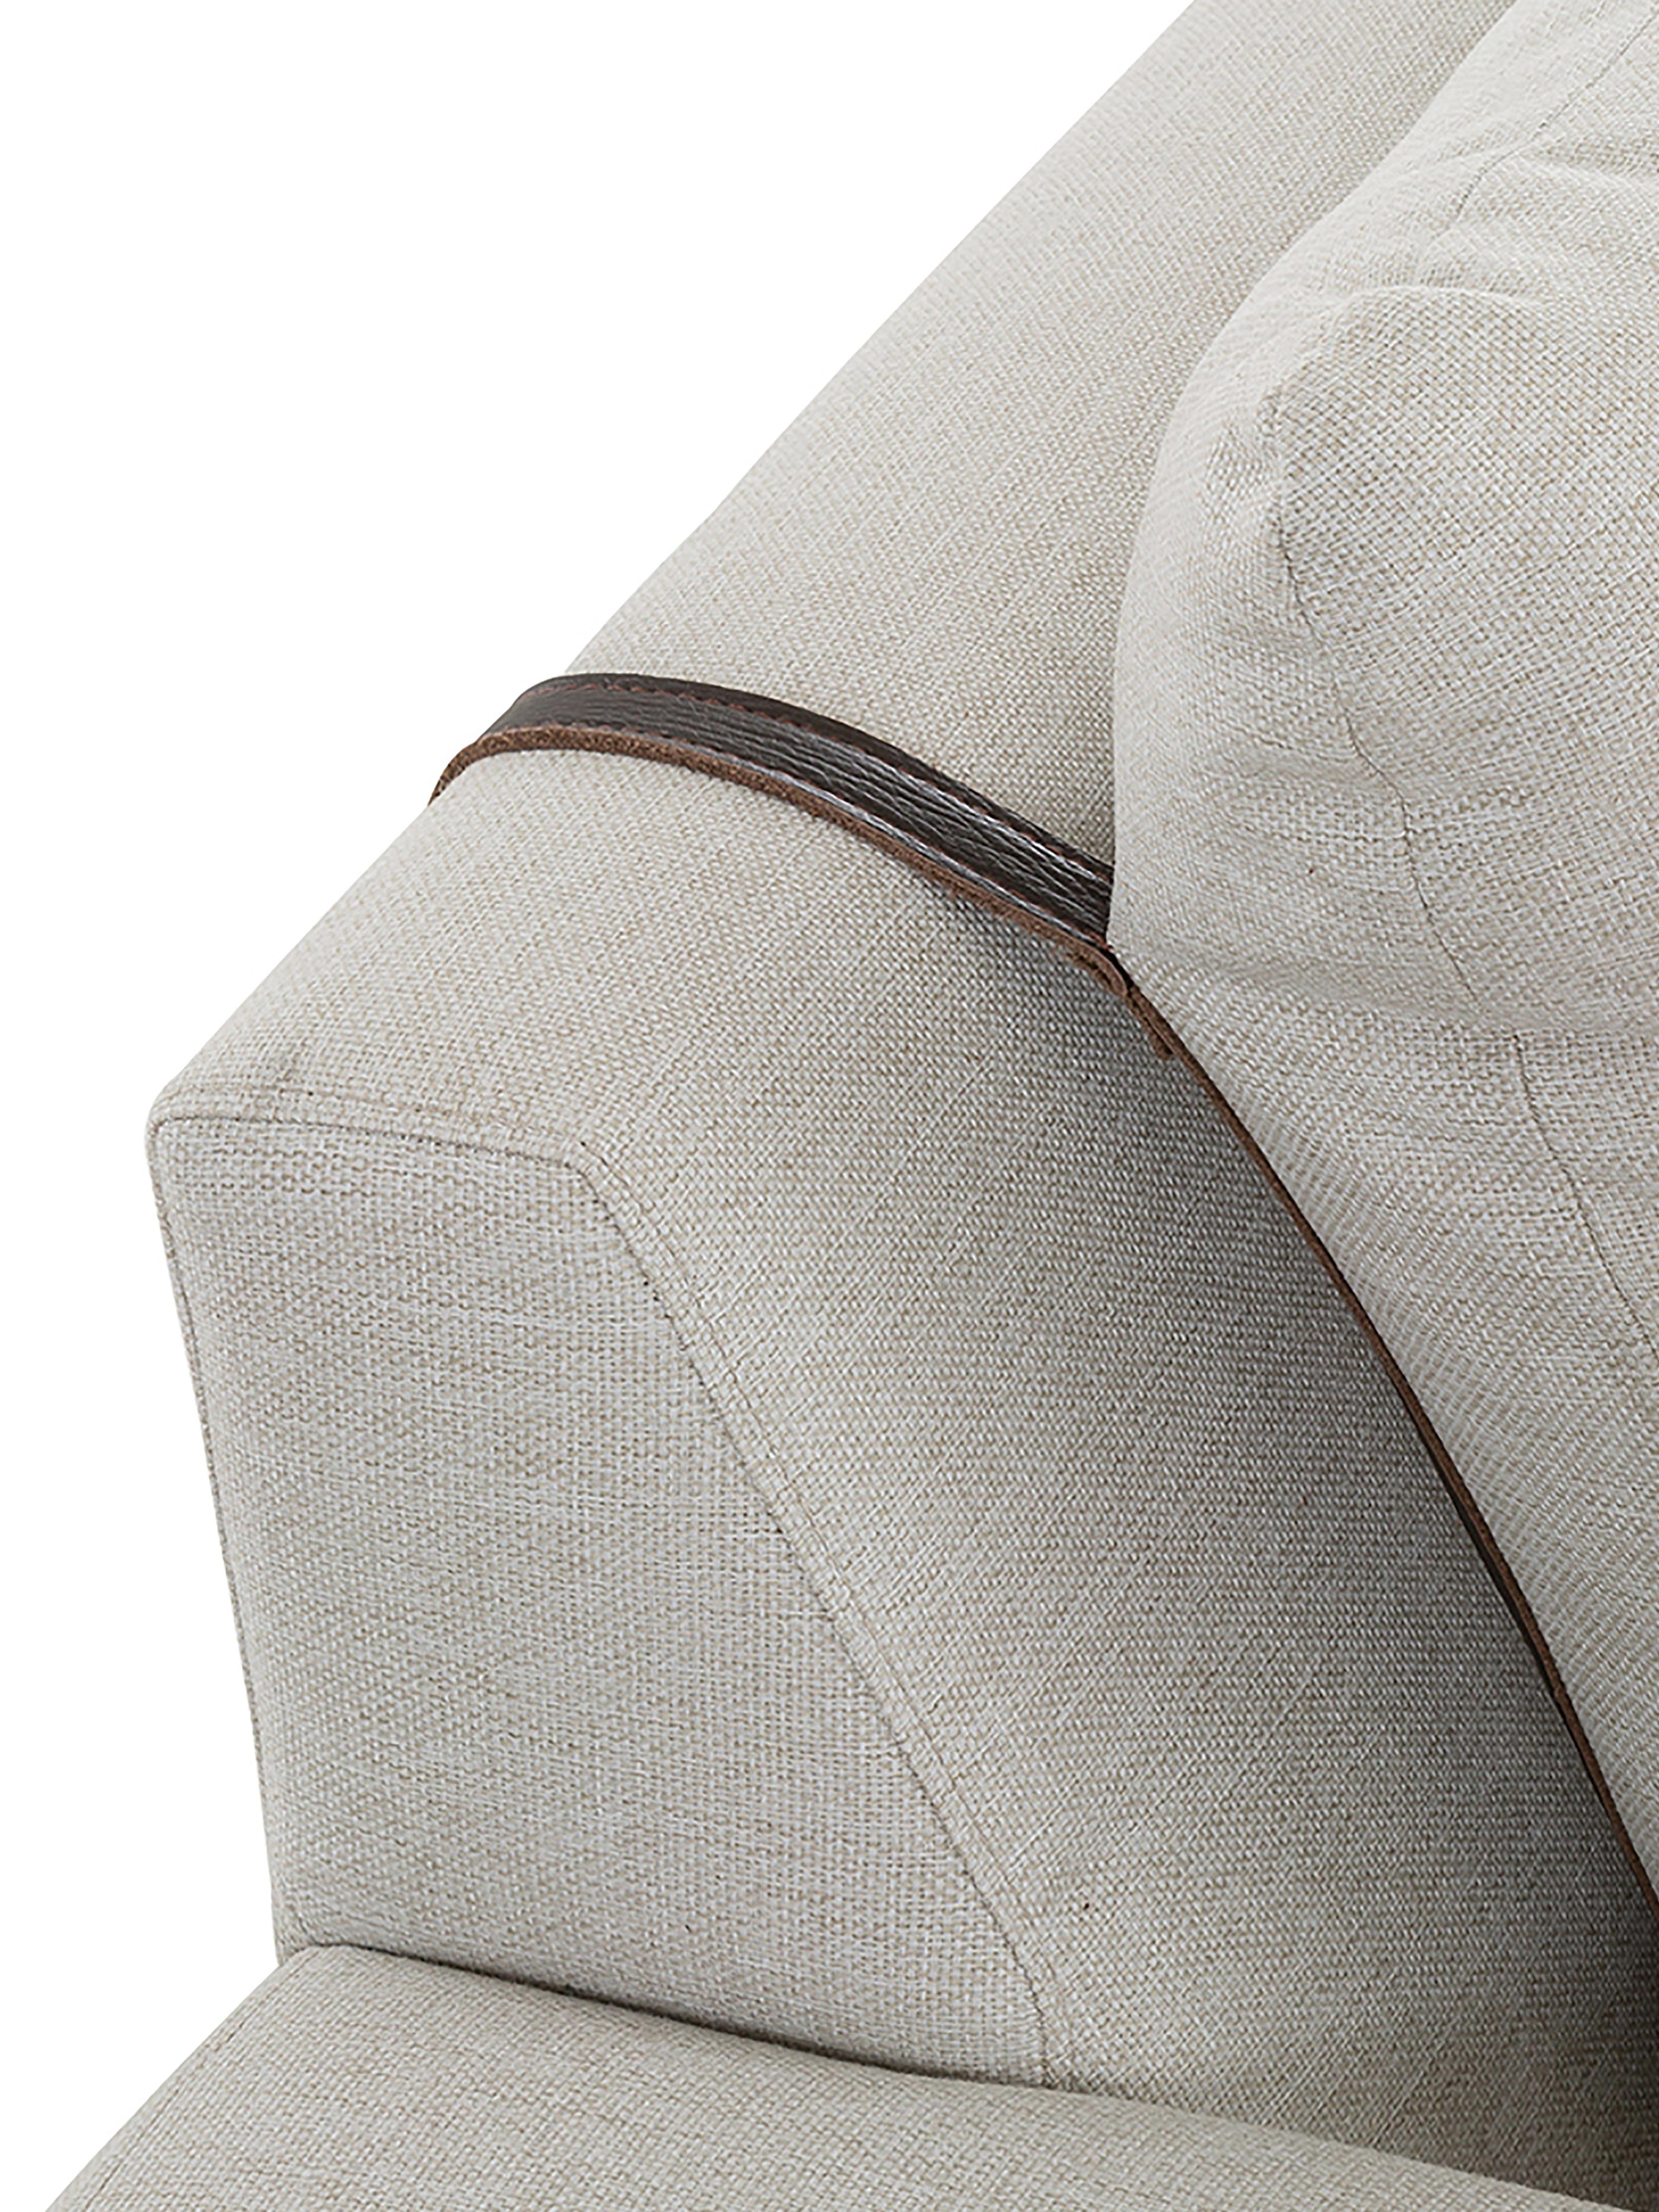 Sofa Brooks (3-Sitzer), Bezug: Polyester 35.000 Scheuert, Gestell: Kiefernholz, massiv, Rahmen: Kiefernholz, lackiert, Füße: Metall, pulverbeschichtet, Webstoff Beige, 230 x 75 cm